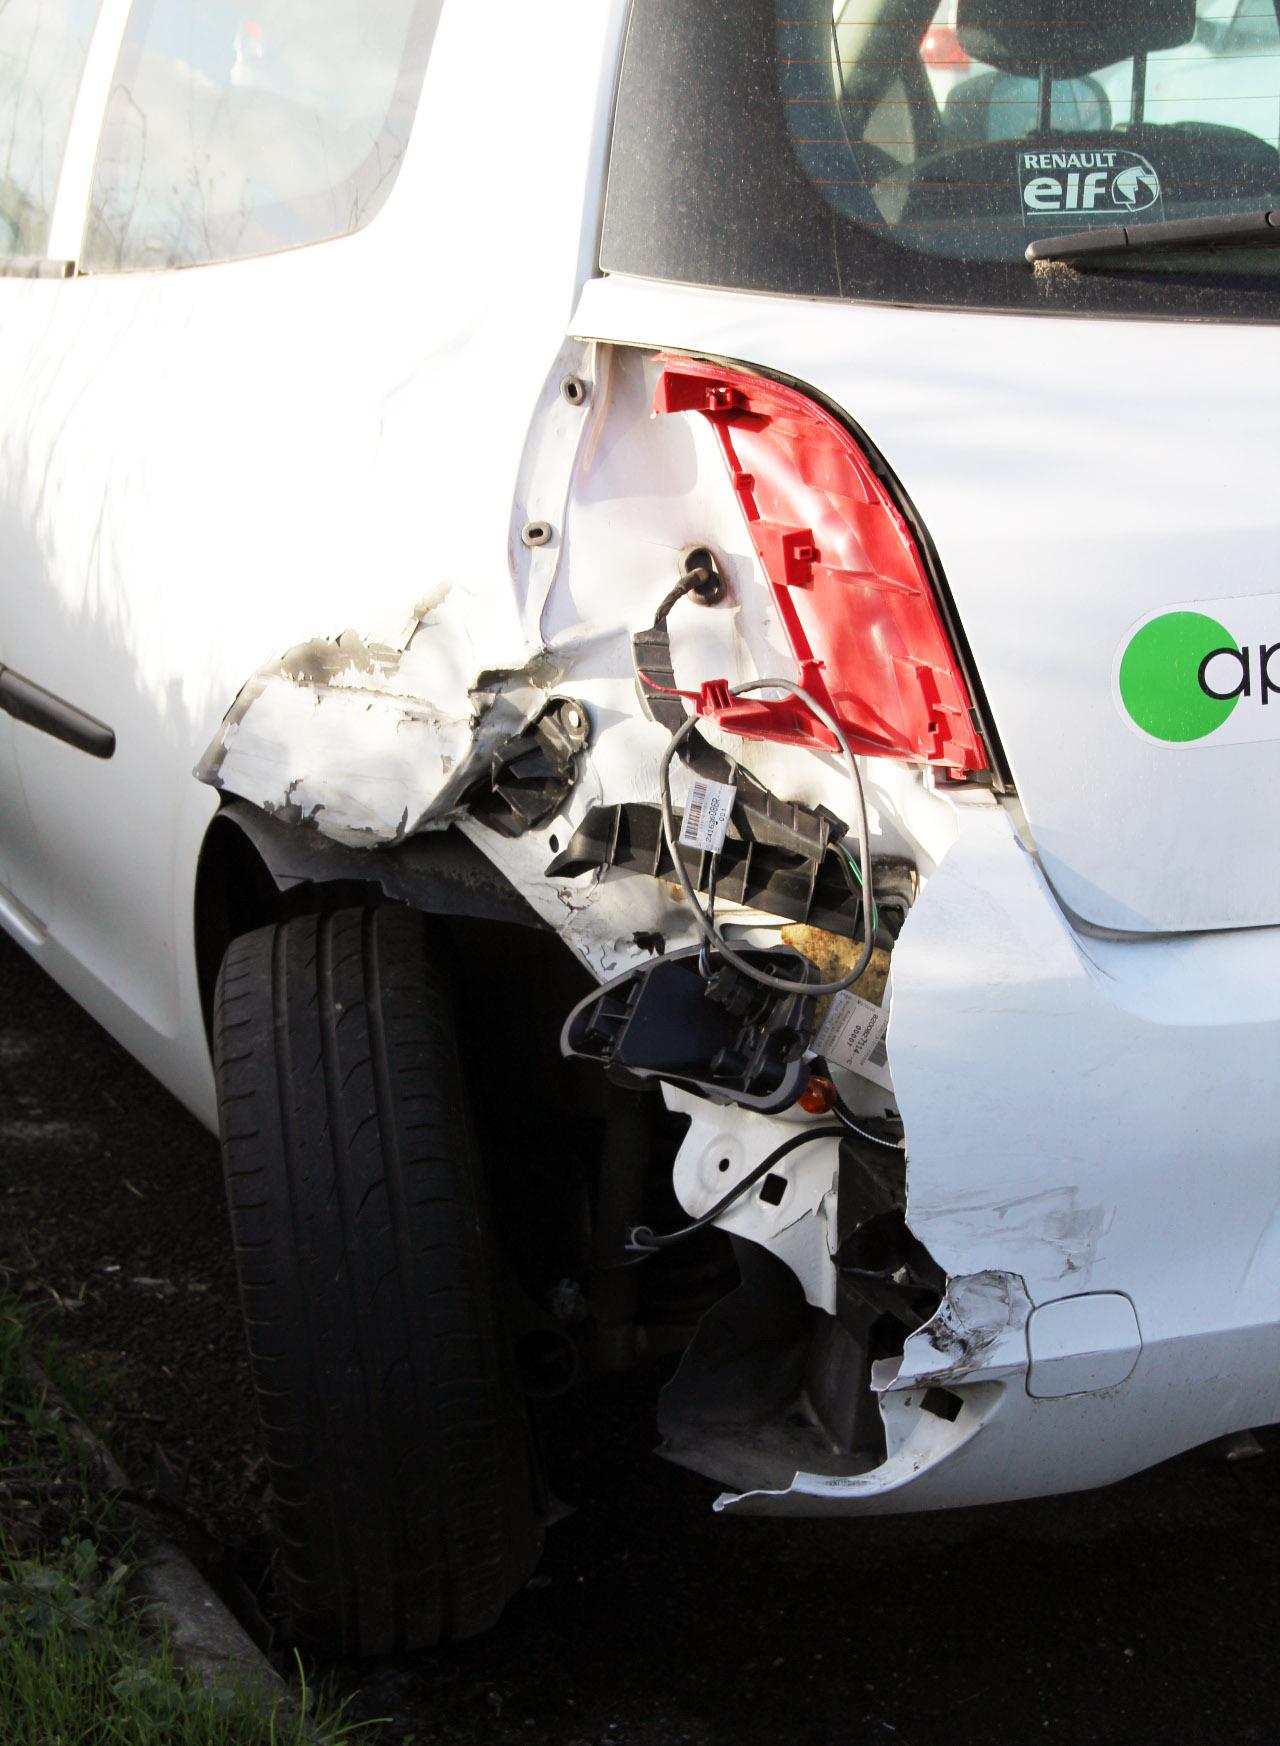 RENAULT CLIO III 1.5 DCI accidentée